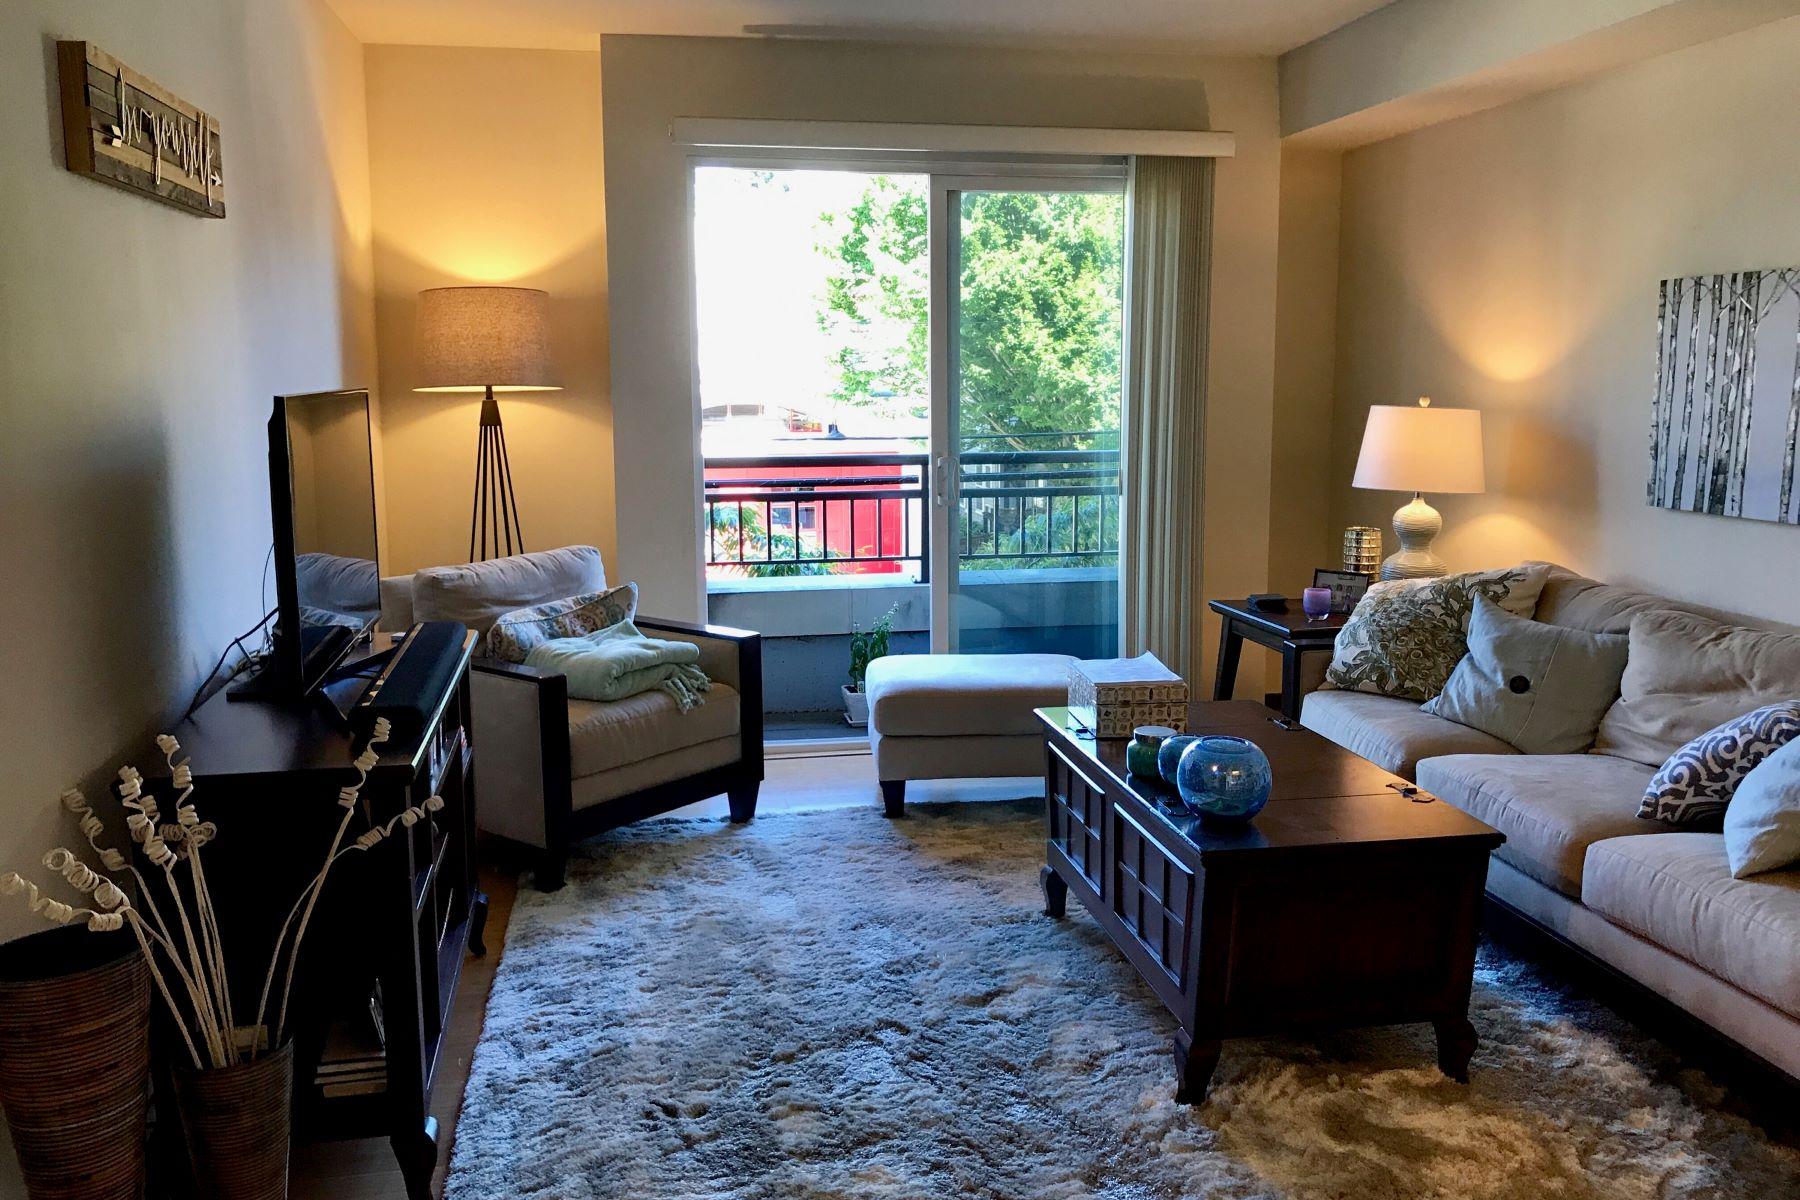 Additional photo for property listing at 413 NE 70th St #203  Seattle, Вашингтон 98115 Соединенные Штаты